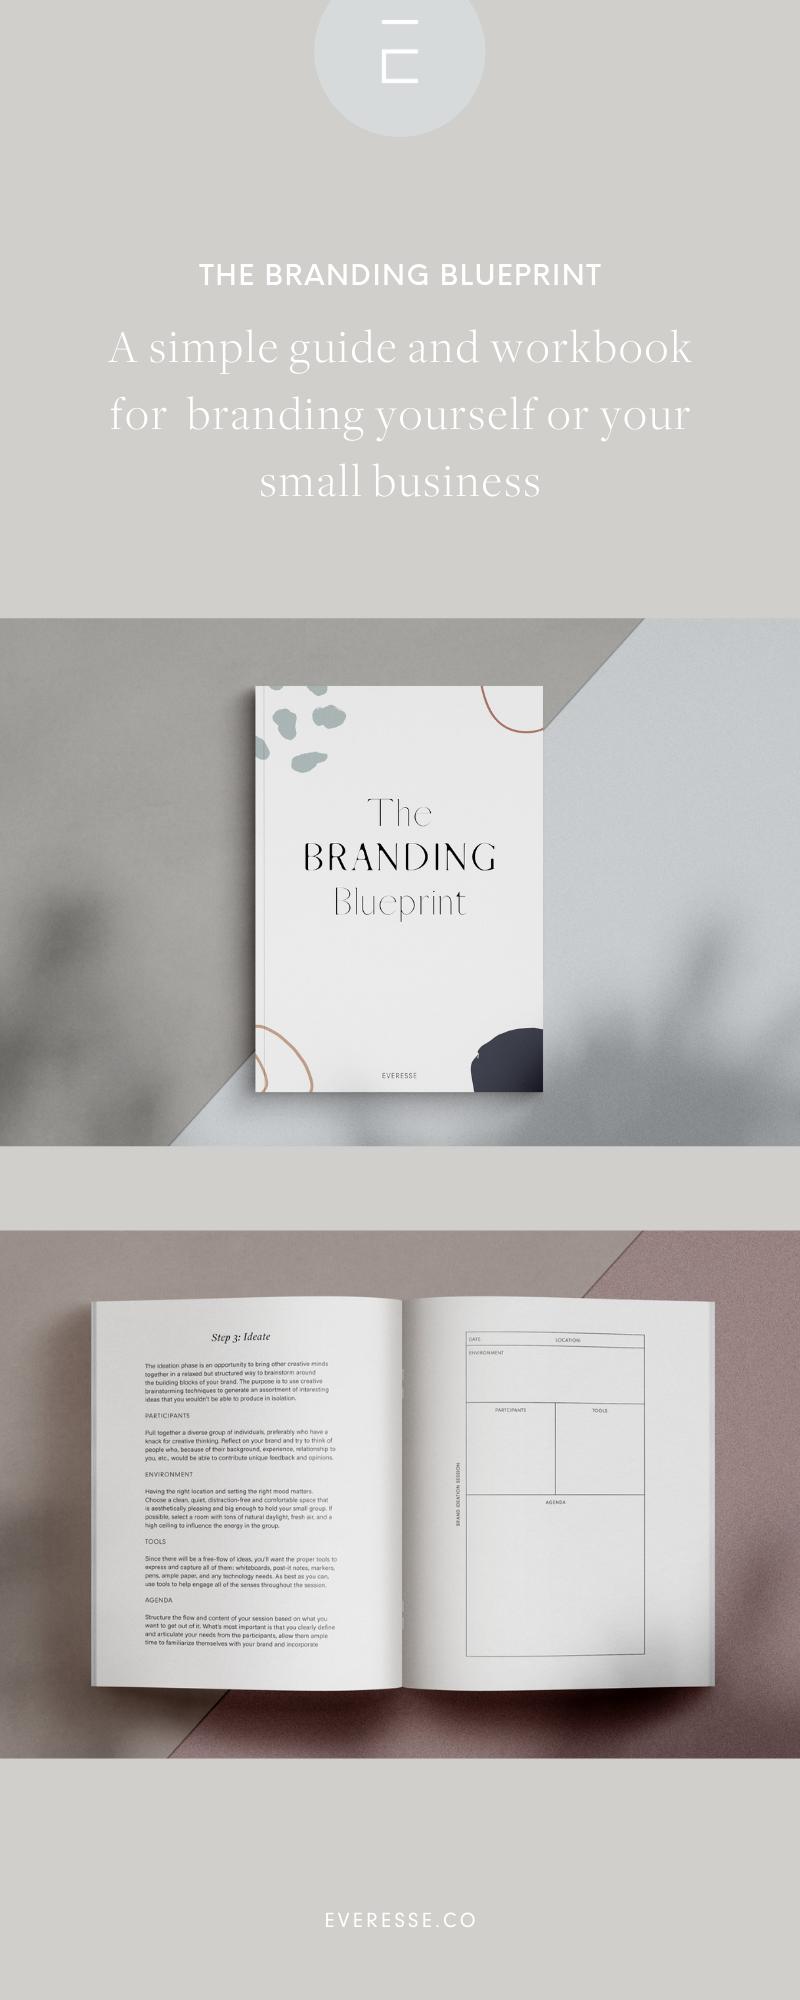 The Branding Blueprint With Images Branding Workbook Branding Small Business Branding